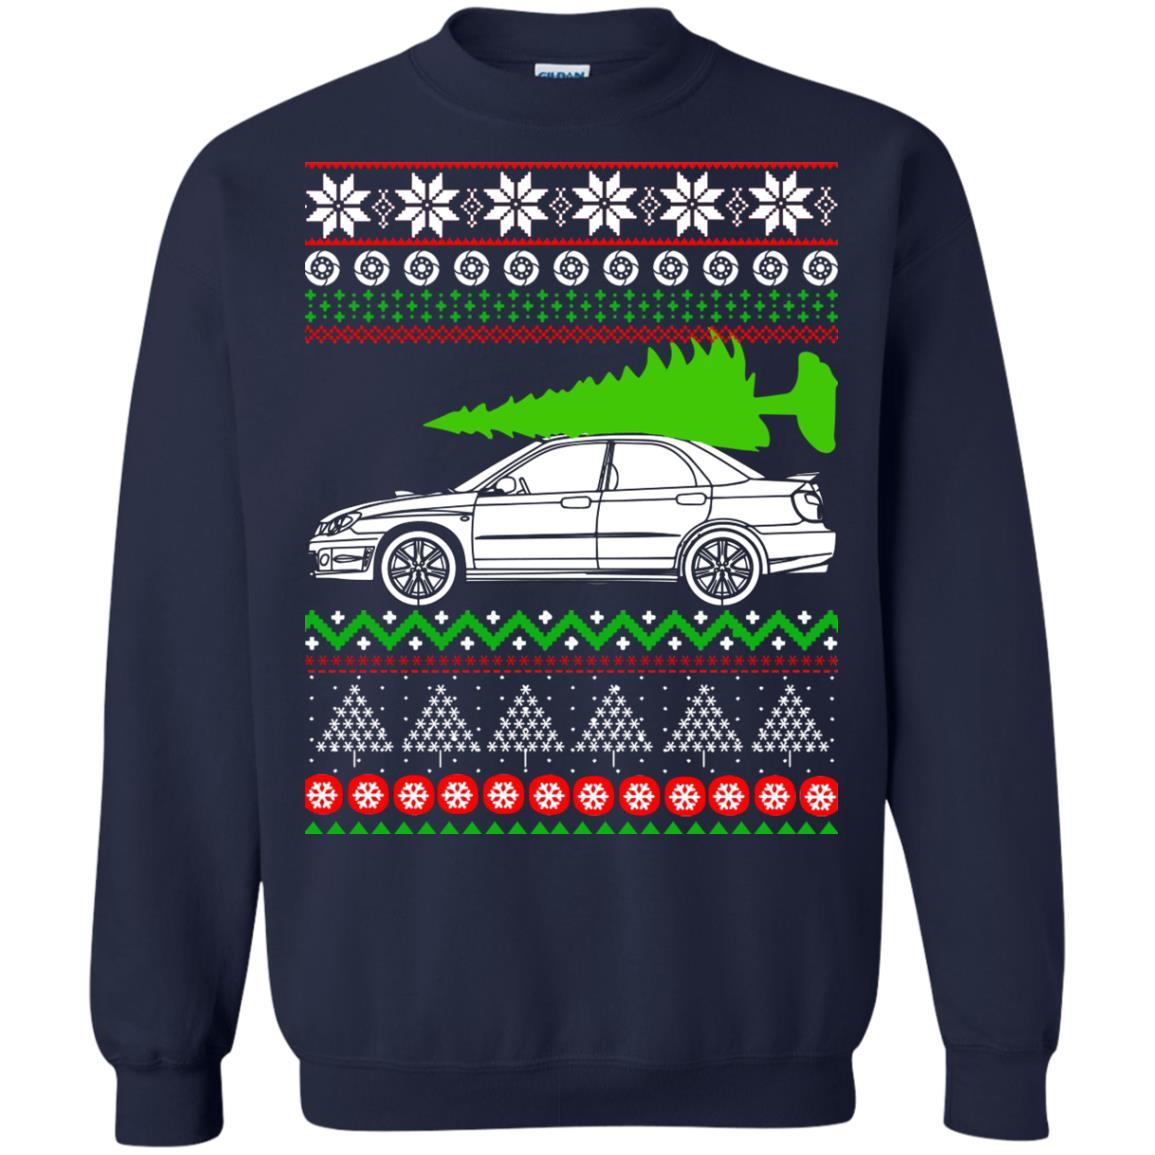 image 6674 - Subaru WRX STI hawkeye Christmas Sweater, Hoodie